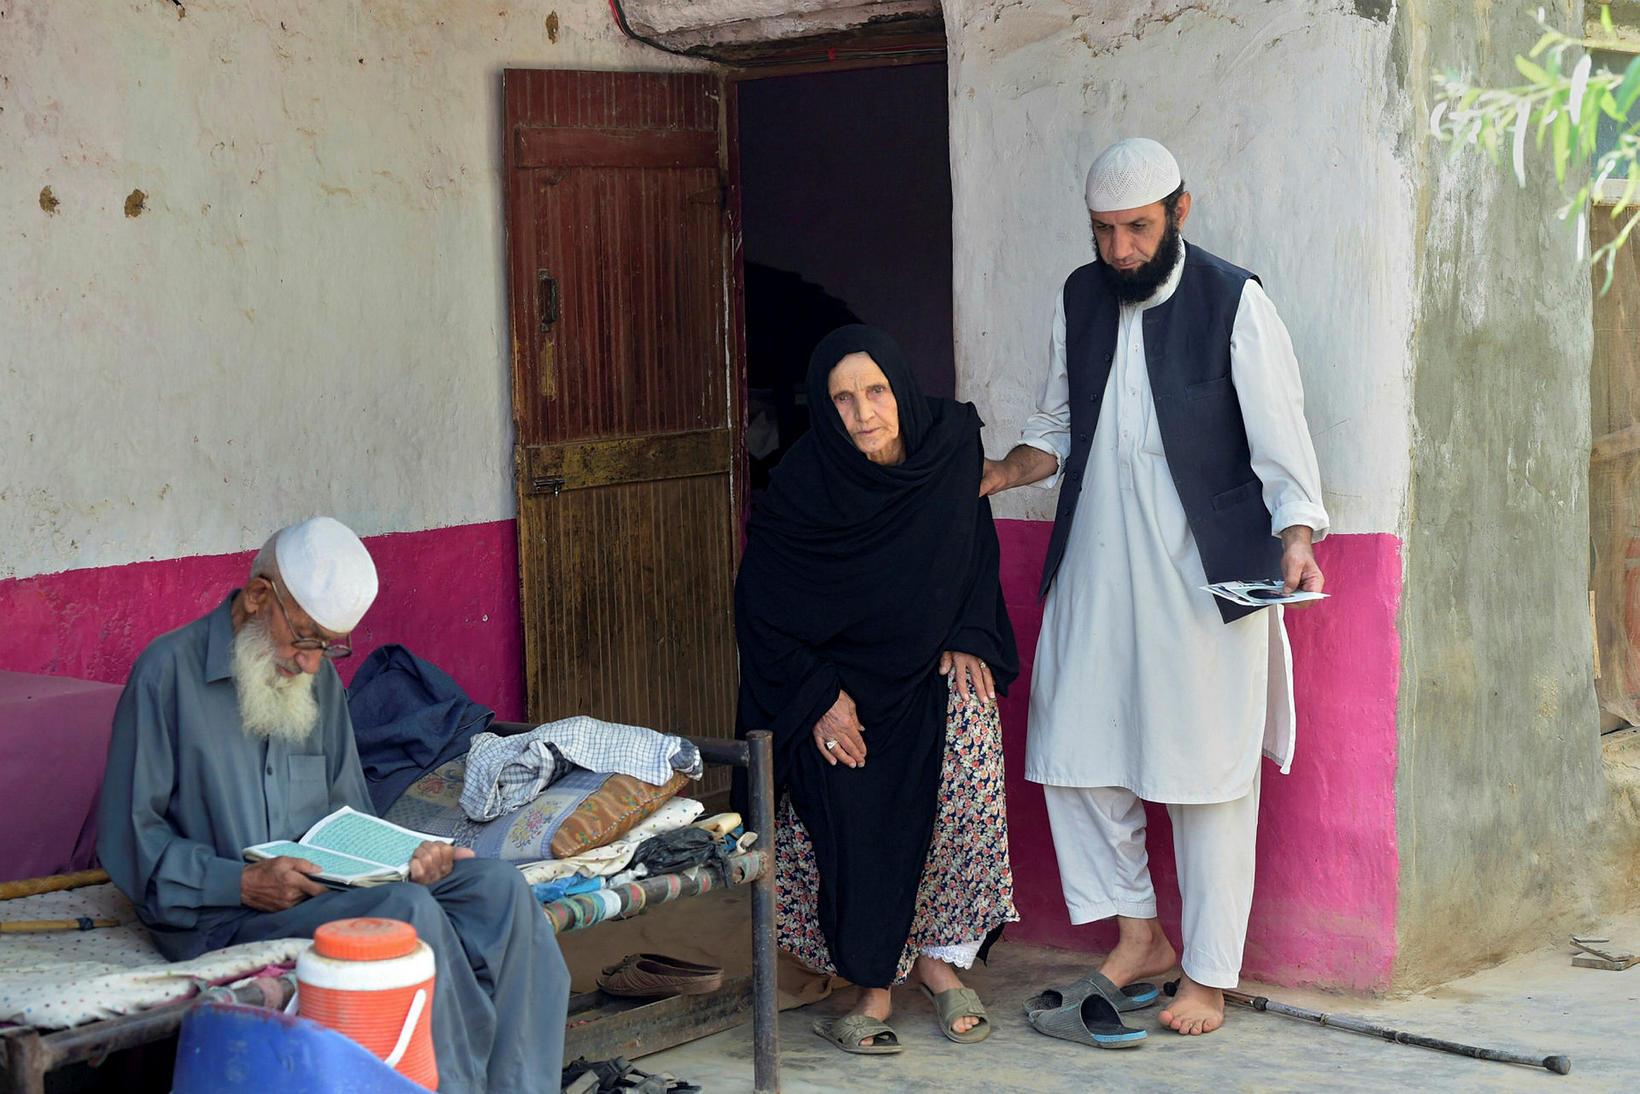 Abdul Ghafar og Sehar Bibi eru foreldrar Asadullah Haroon en …